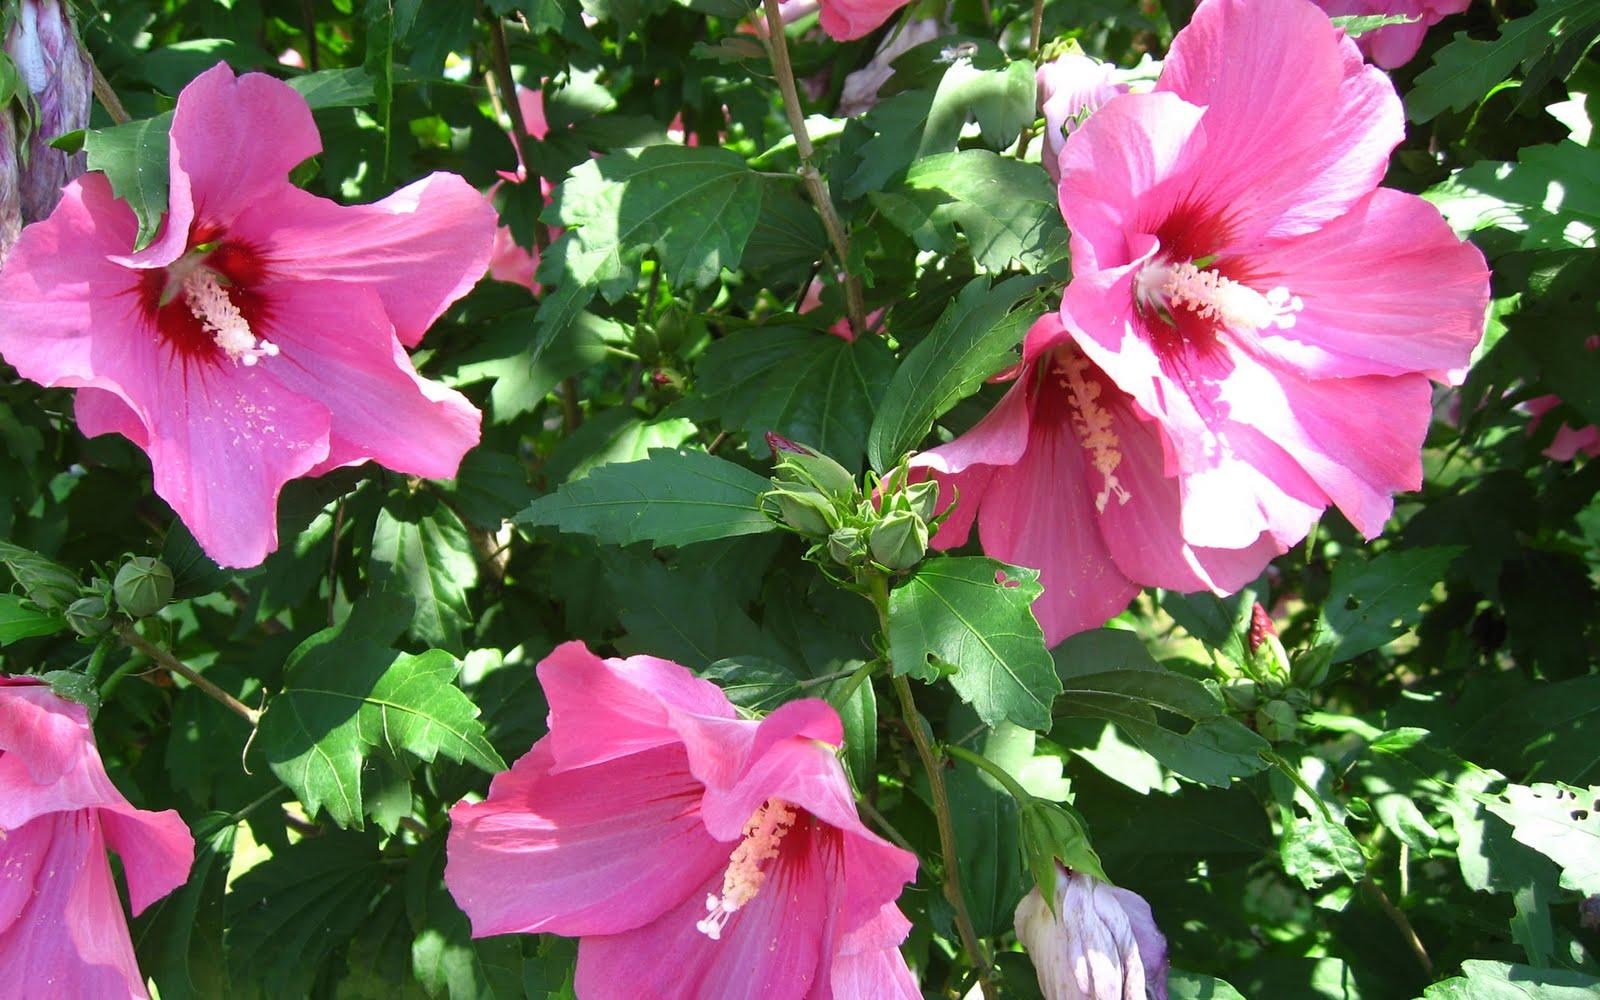 http://3.bp.blogspot.com/-NQ2wnmi6W10/TdoDlwLmKpI/AAAAAAAADr8/9WVe2ZohmLw/s1600/flower-wallpaper-full-hd-hibiscus.jpg